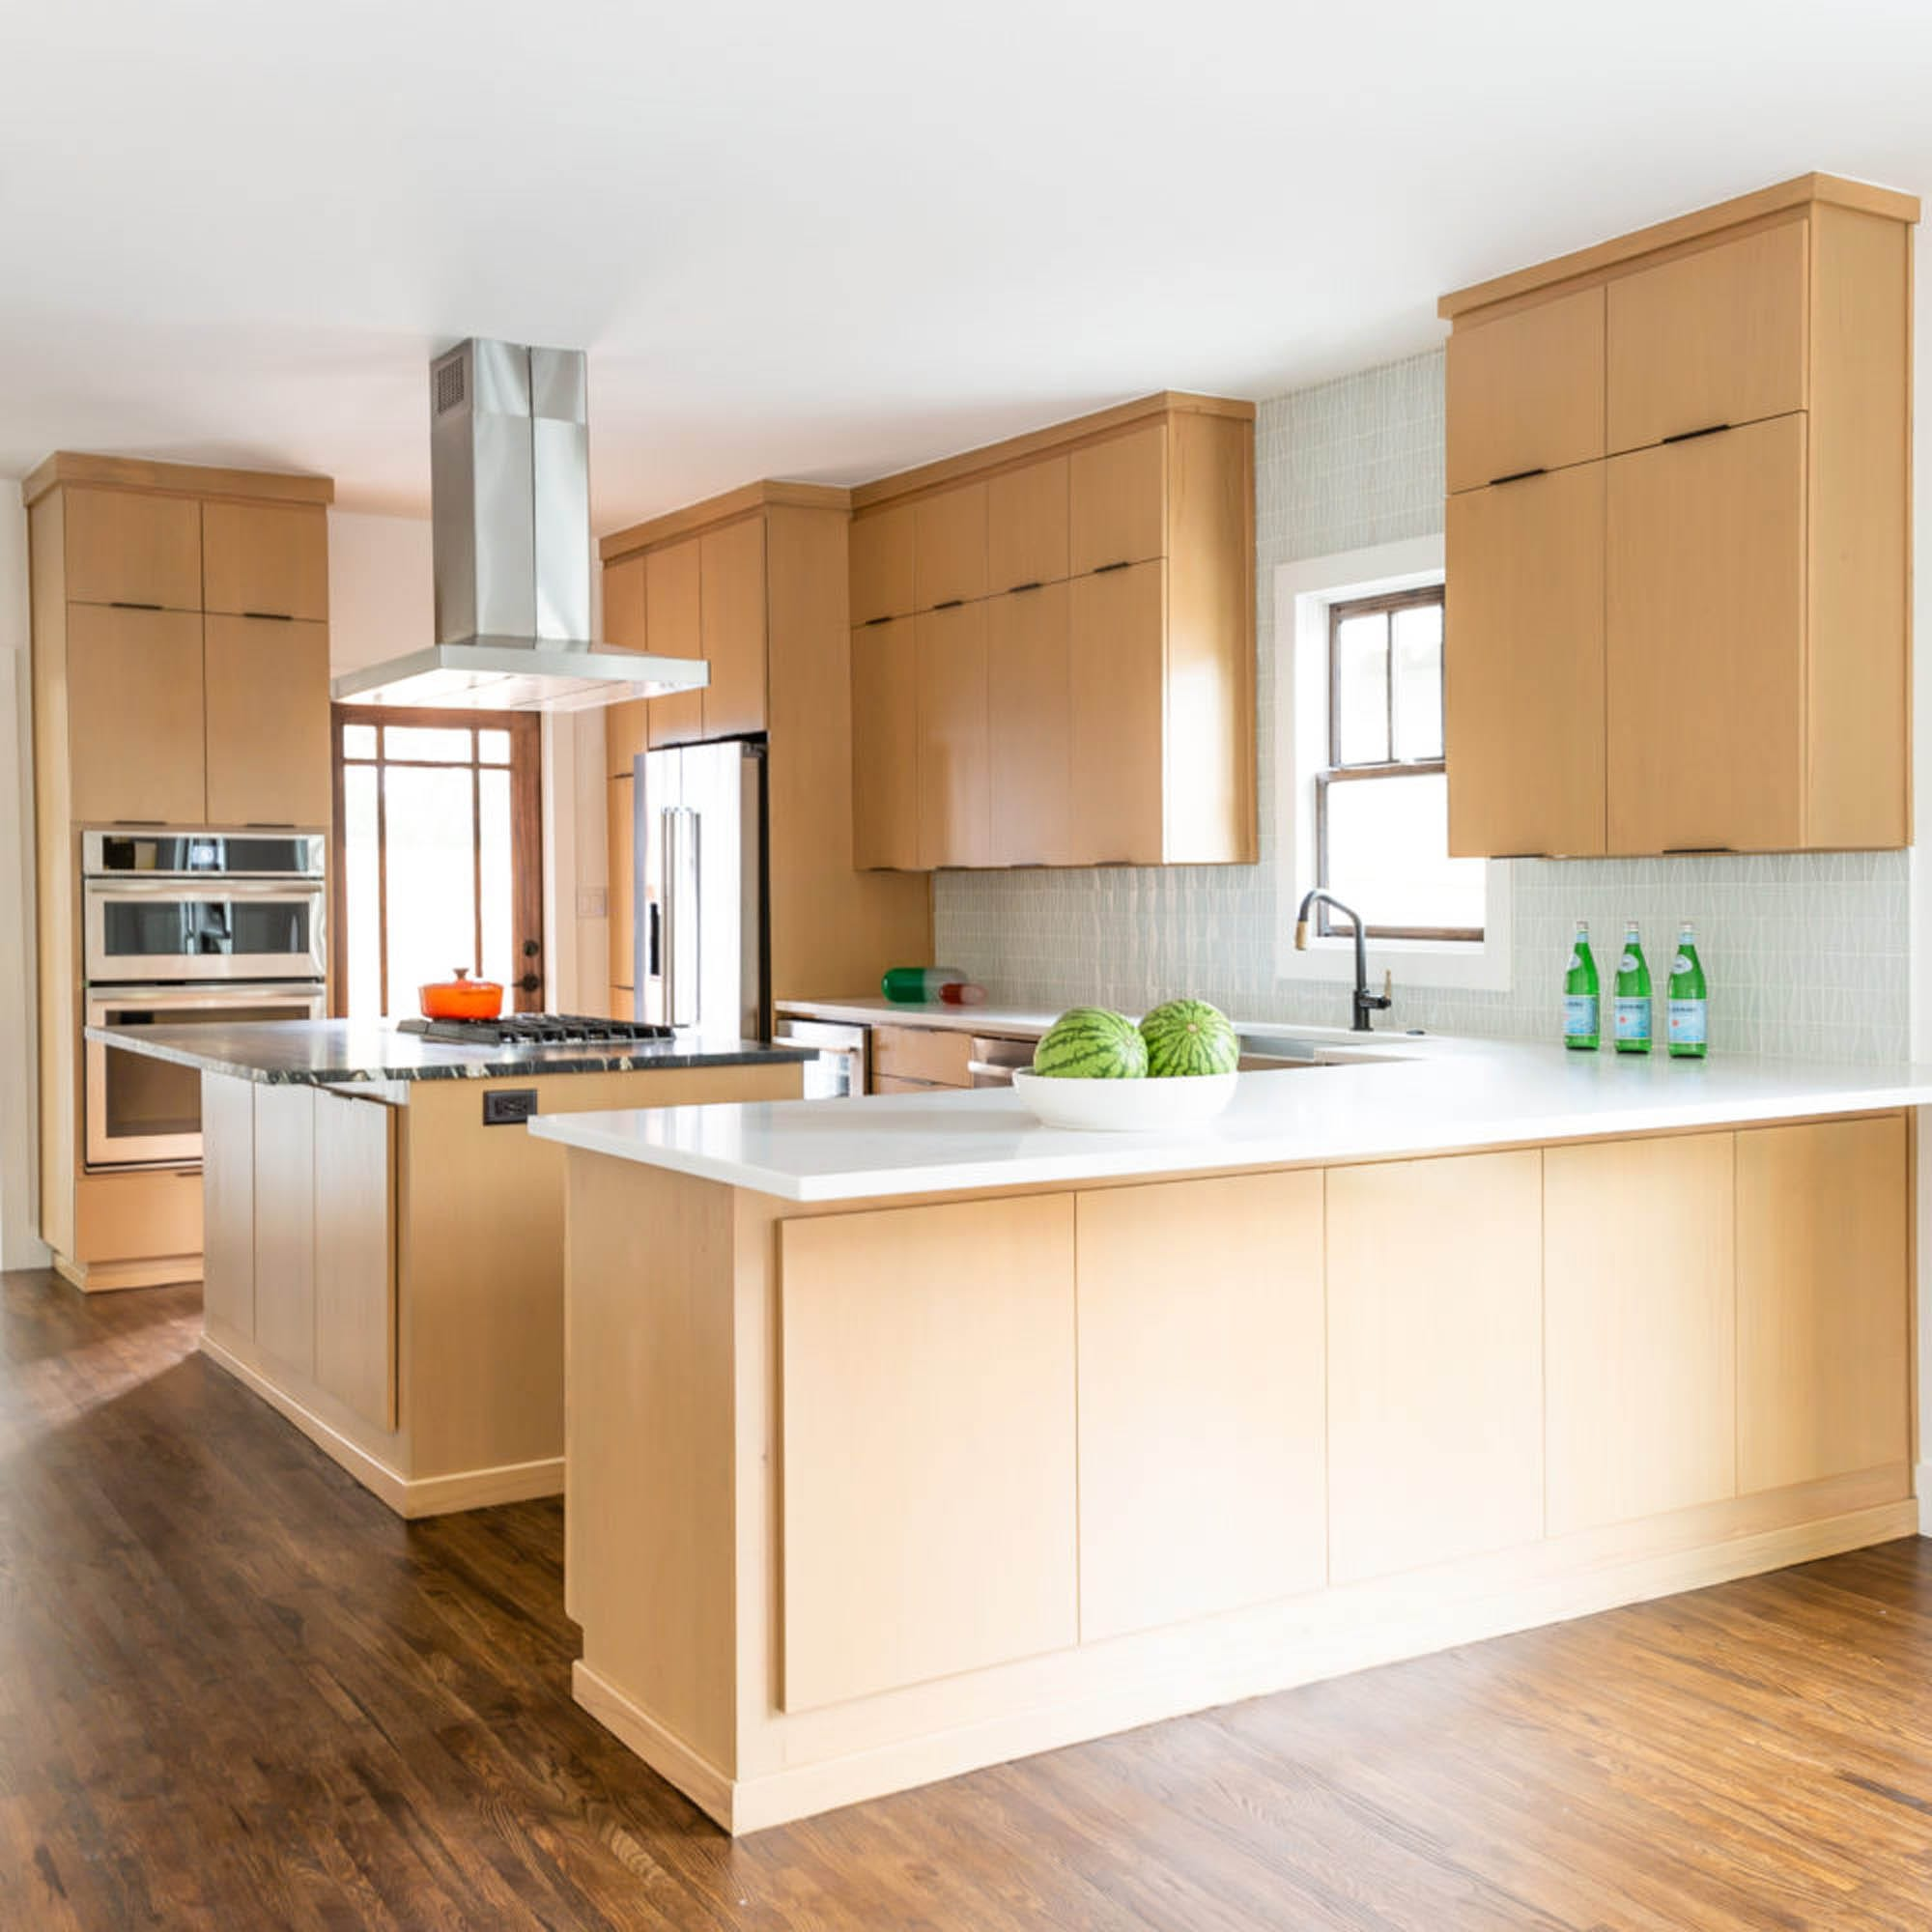 Warm wood and white tile backsplash kitchen